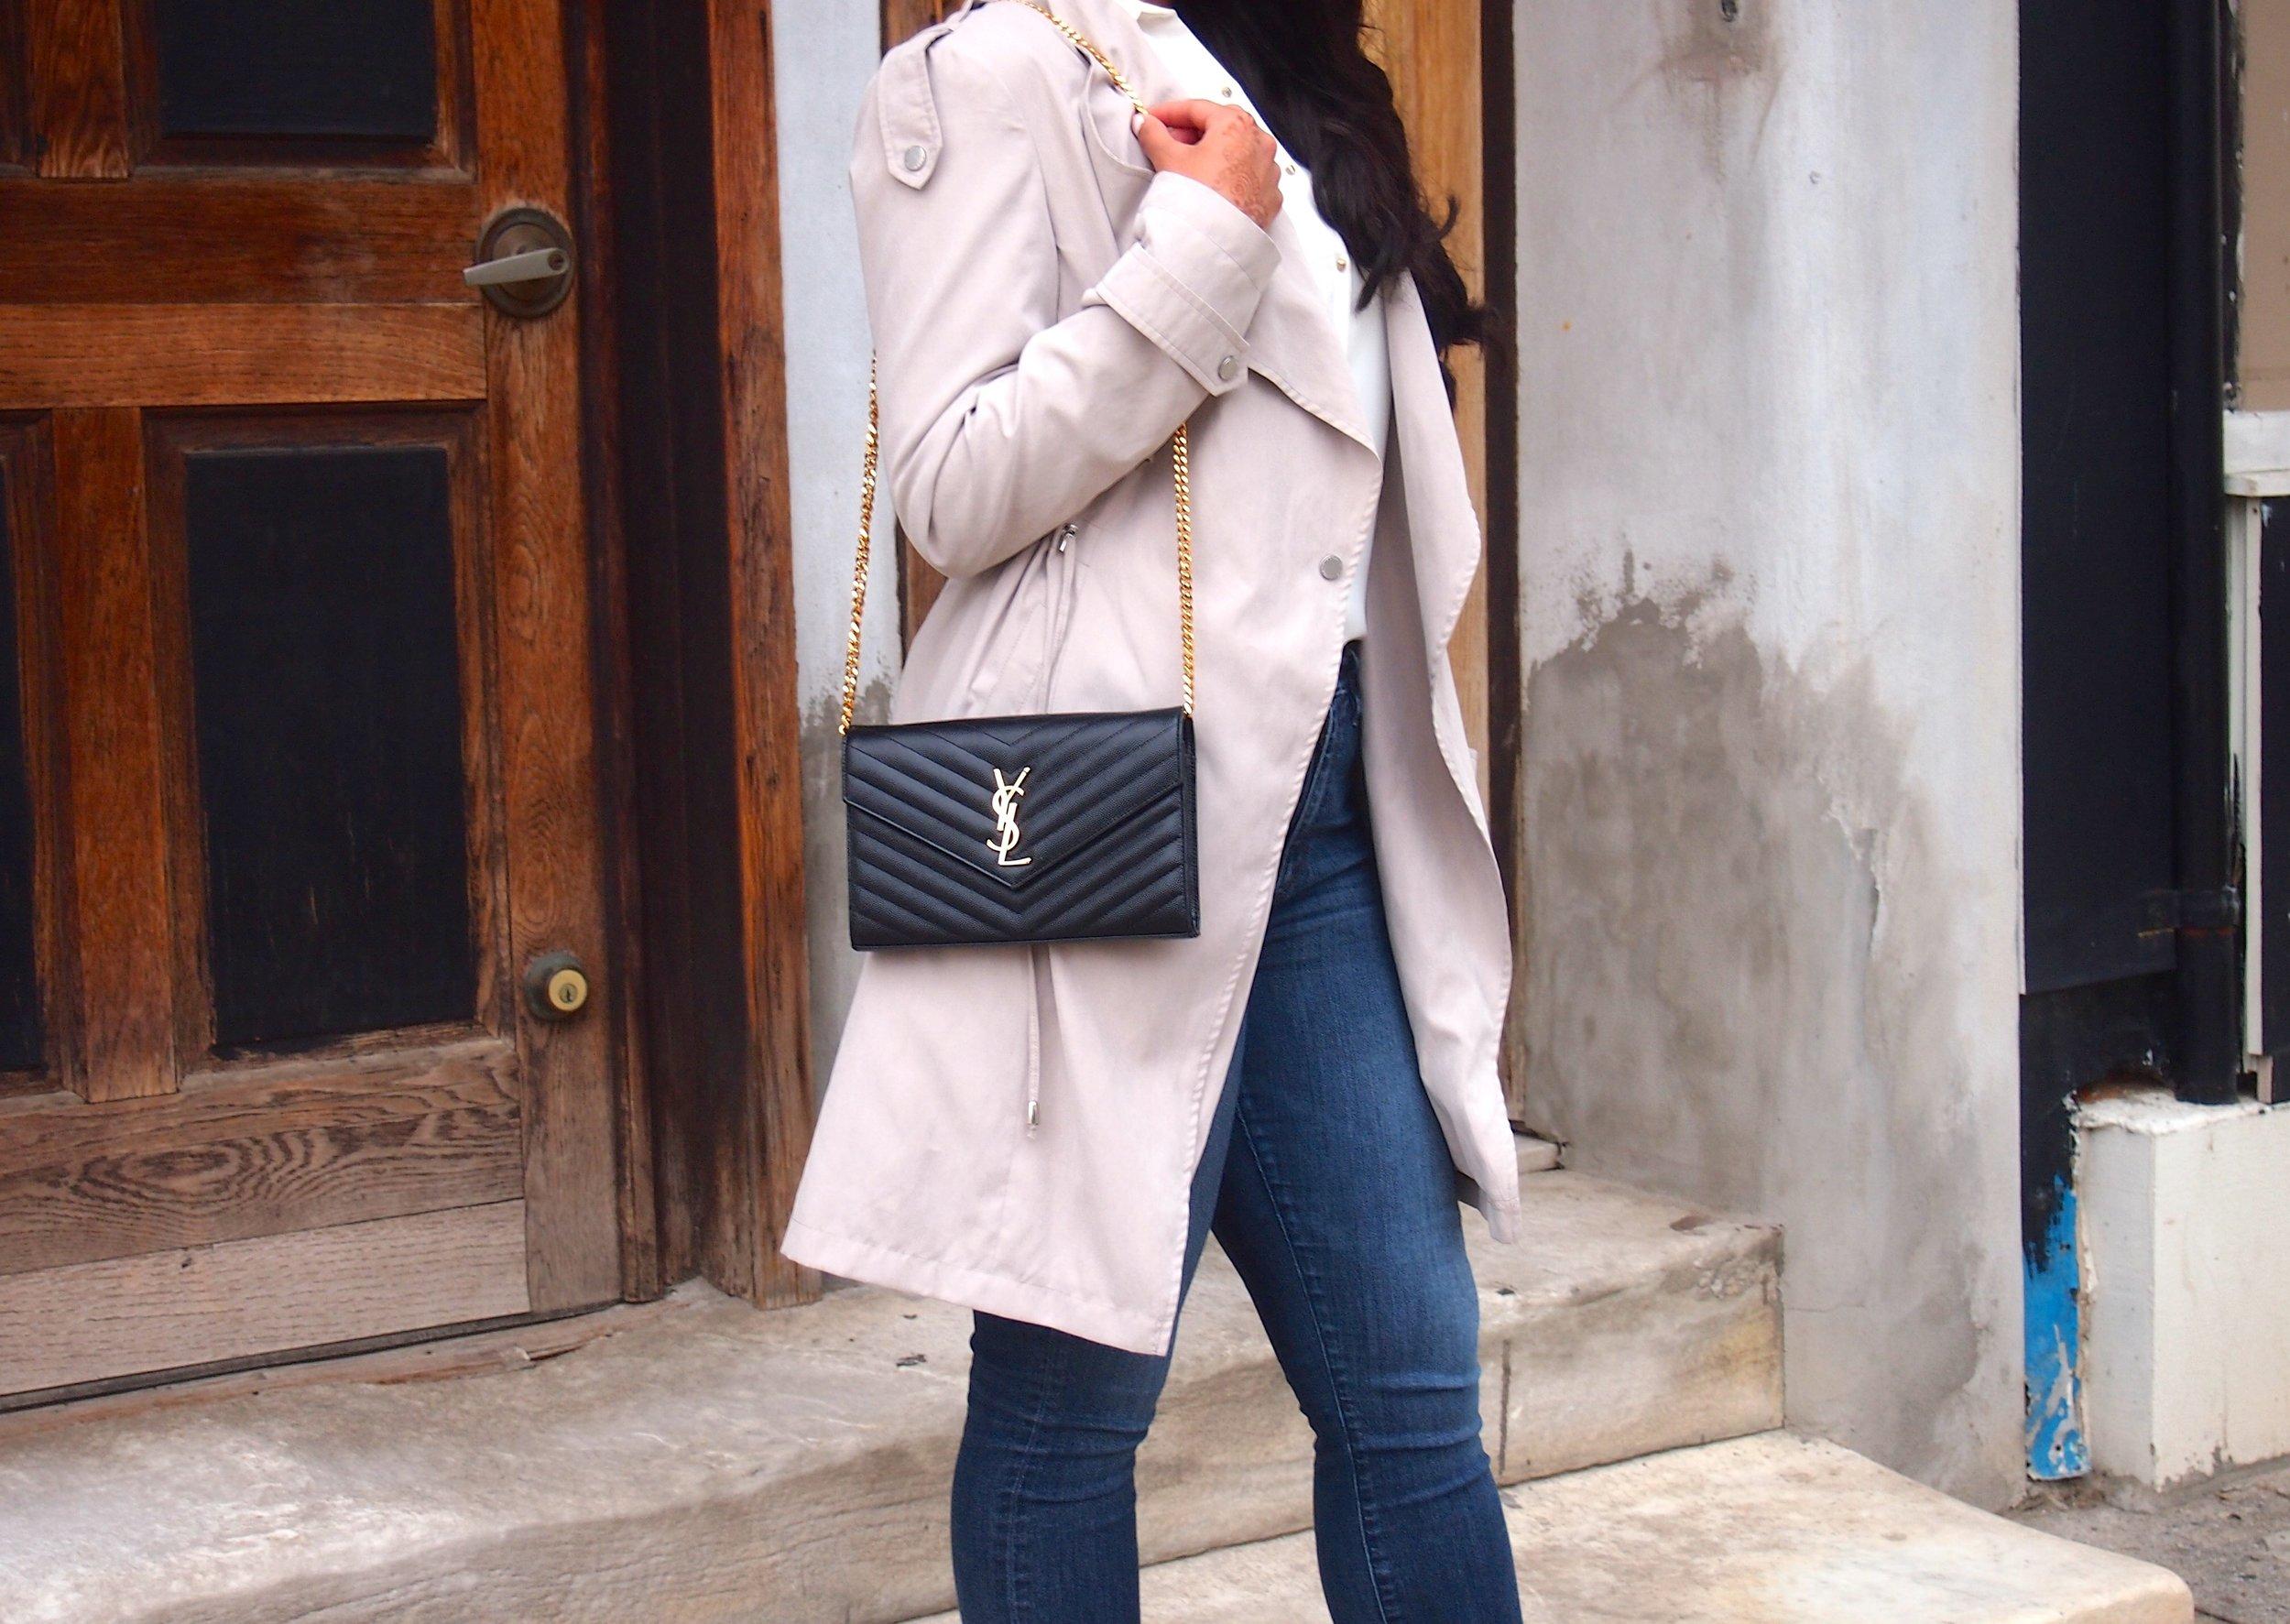 favorite-designer-handbag-YSL-wallet-on-chain.jpg